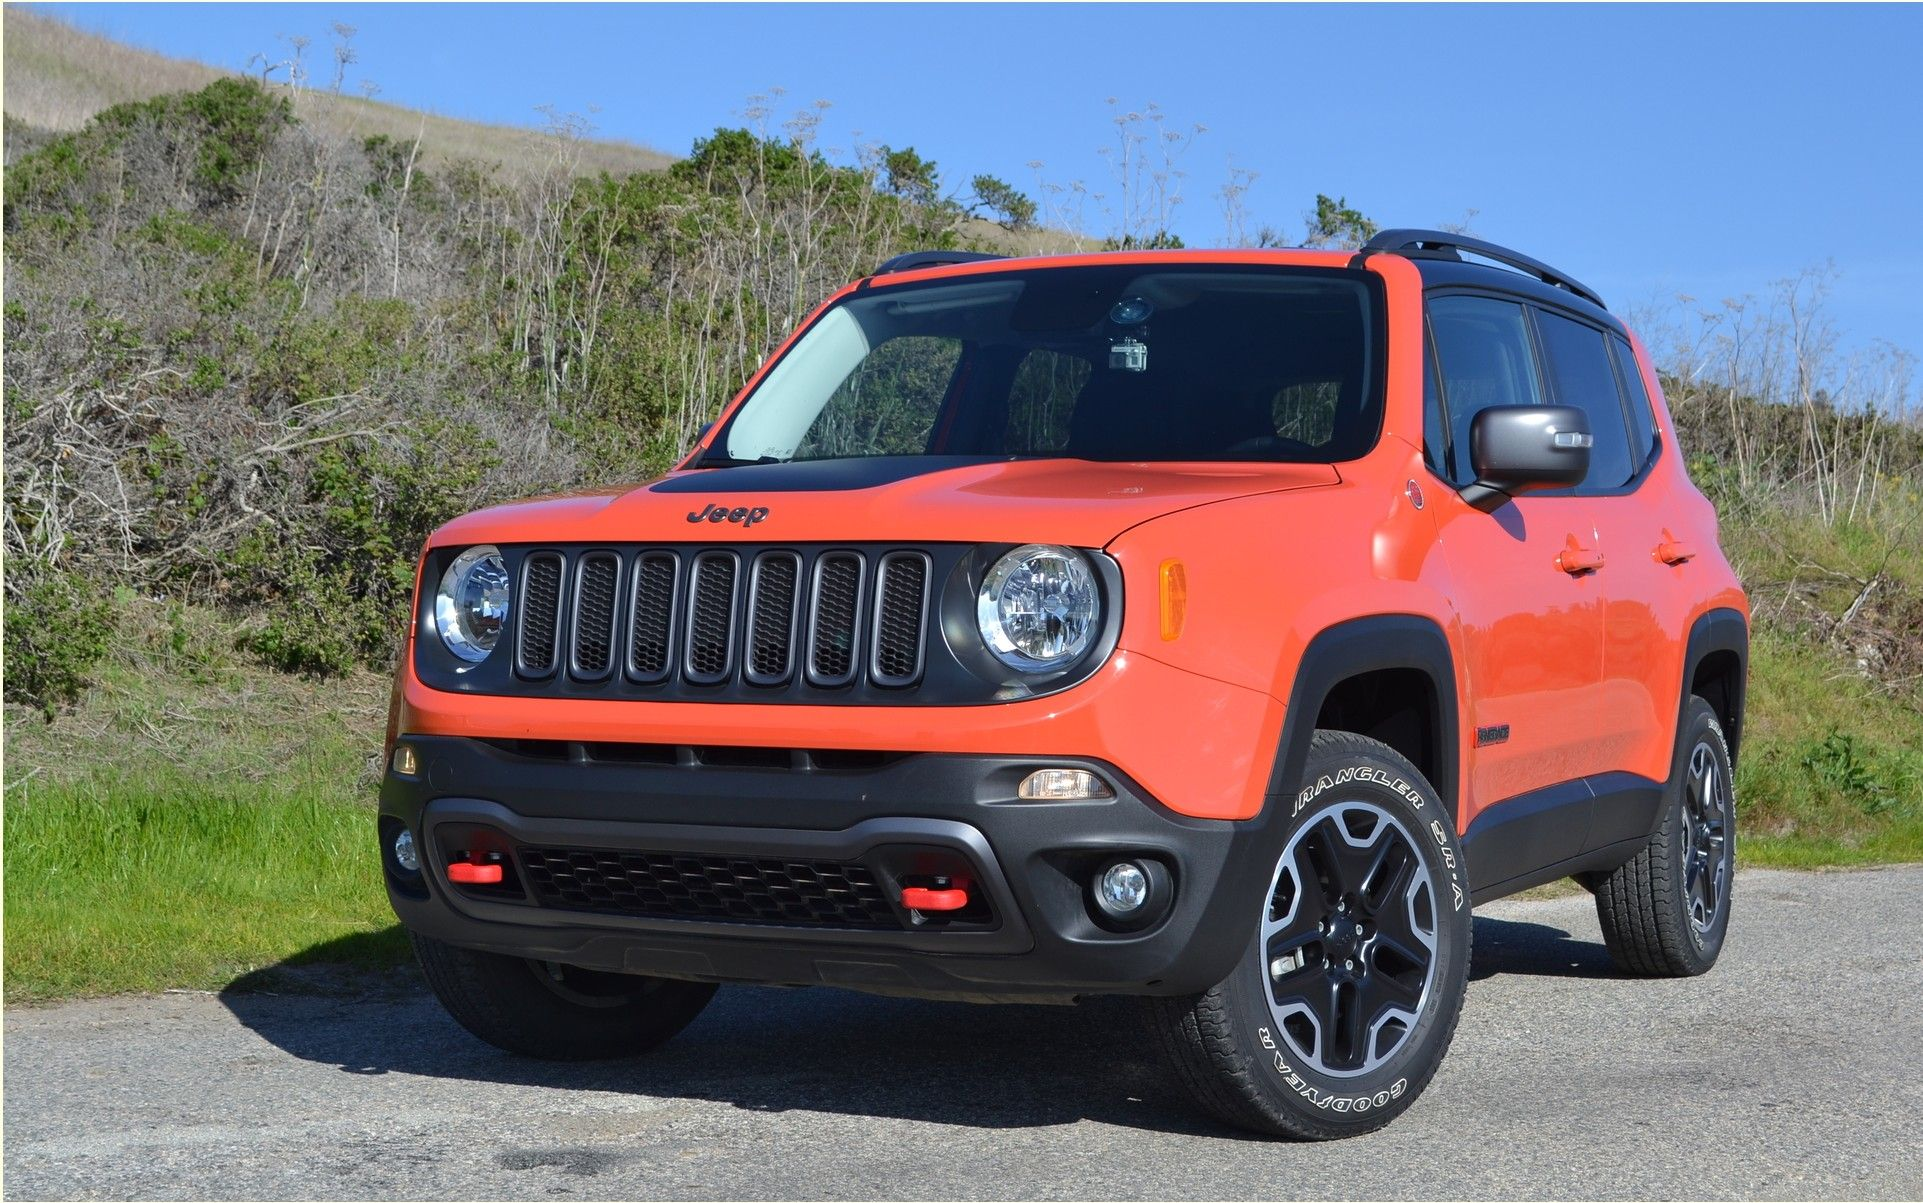 Jeep Renegade 2016 The overqualified Telefon arka planları